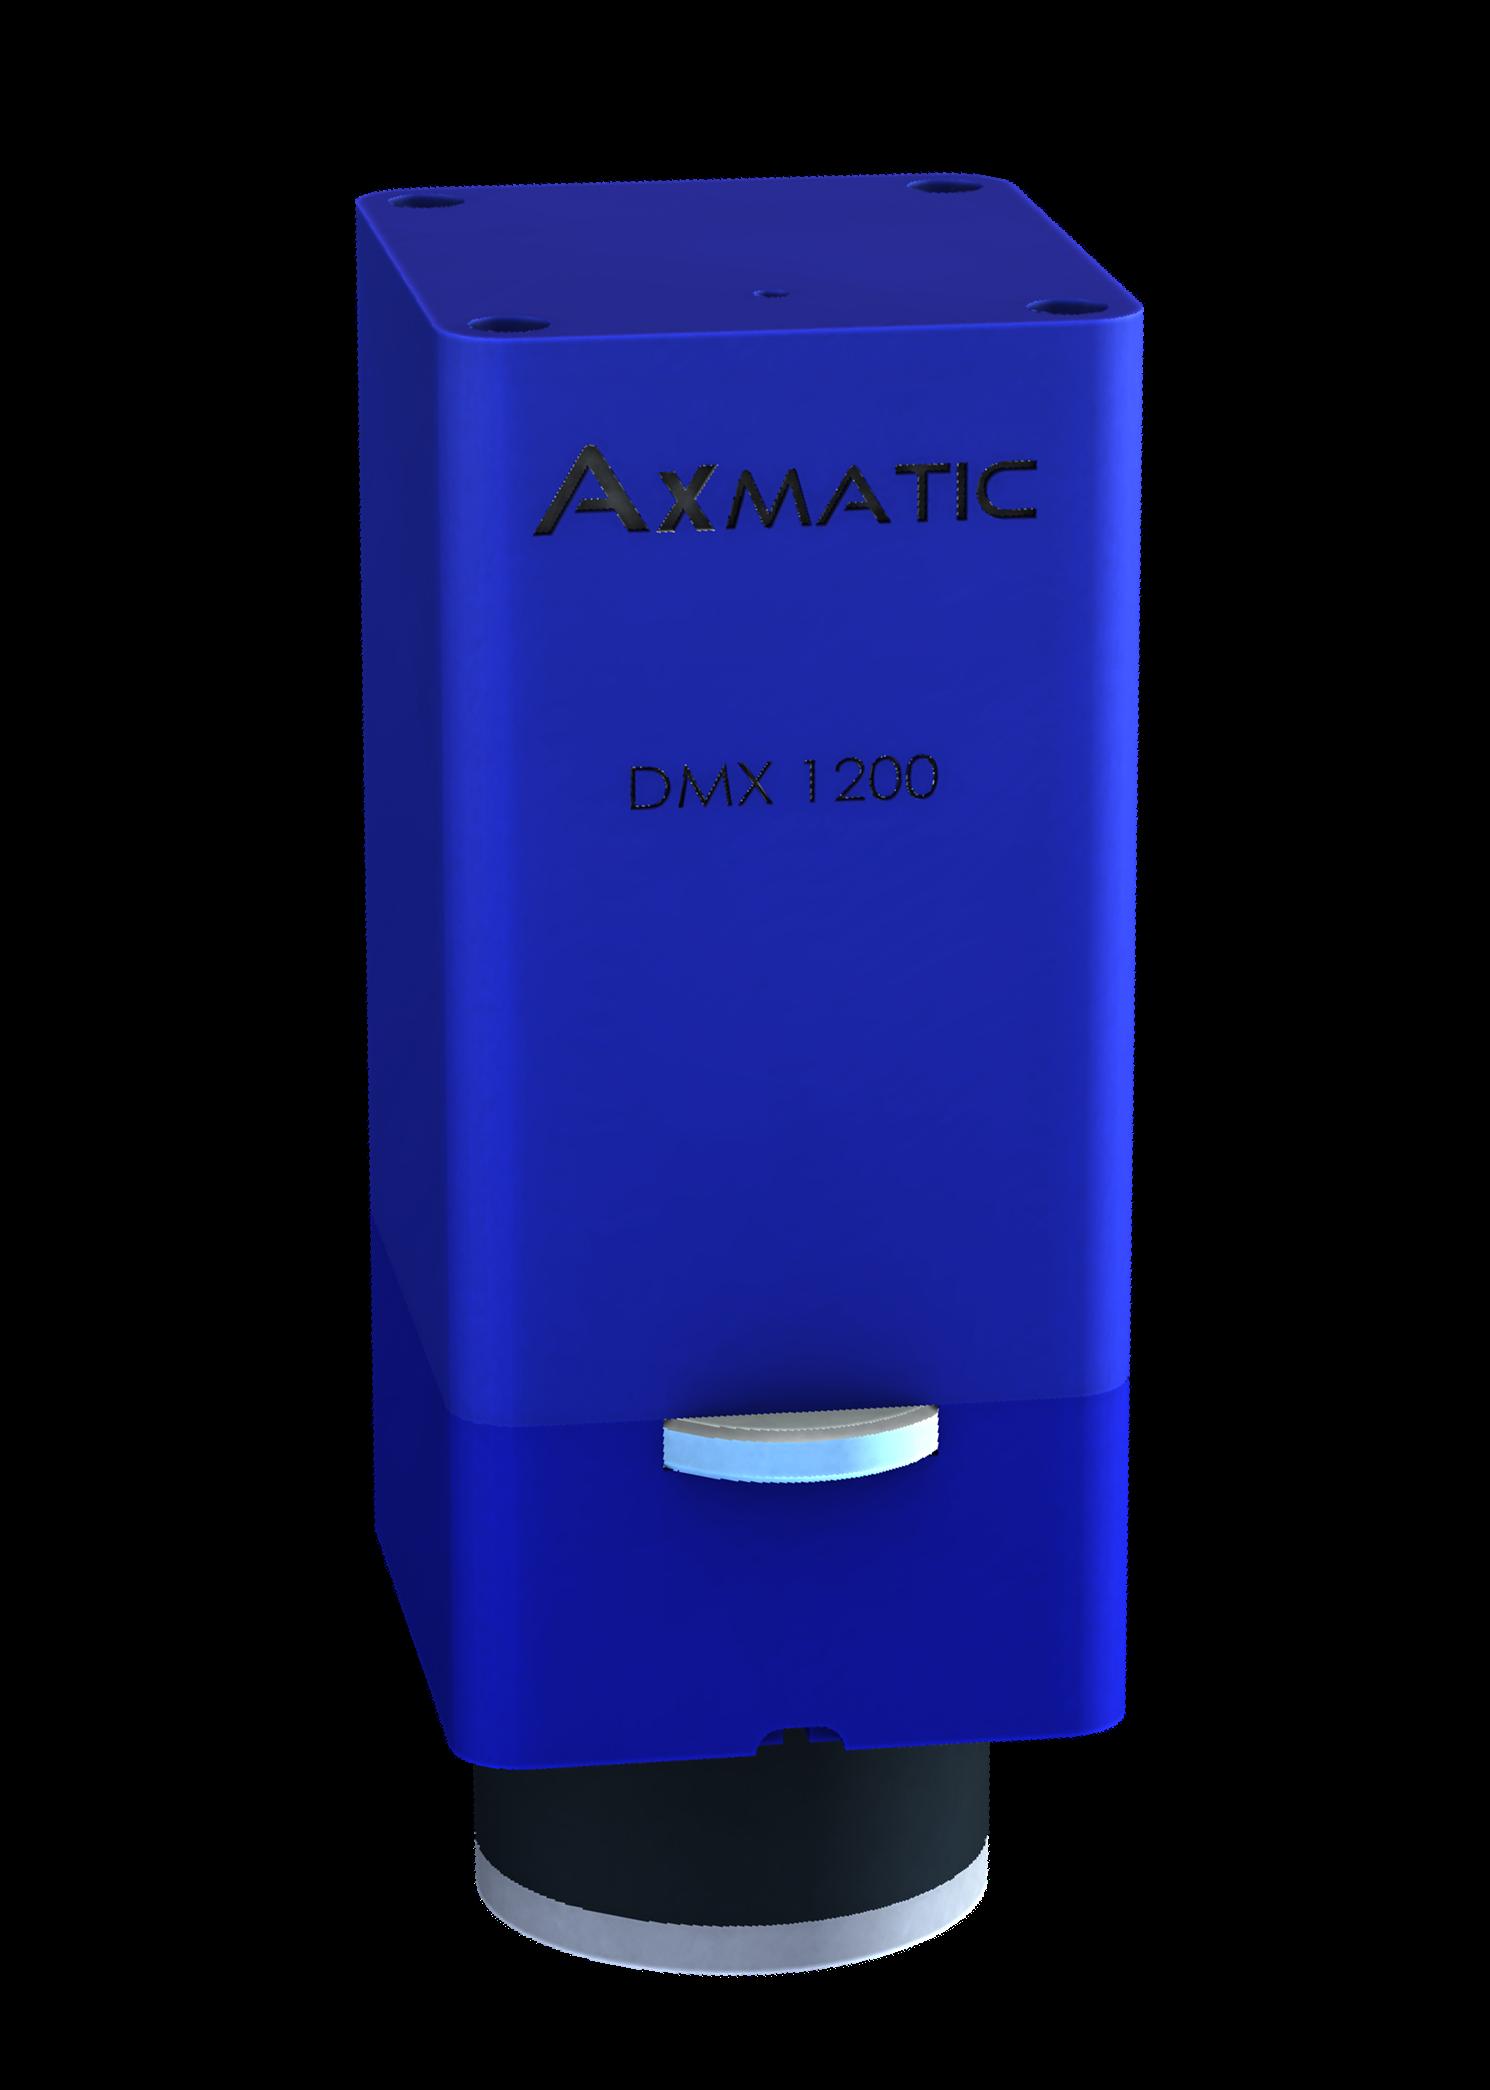 DMX1200_Digital_Microscope_3.psd